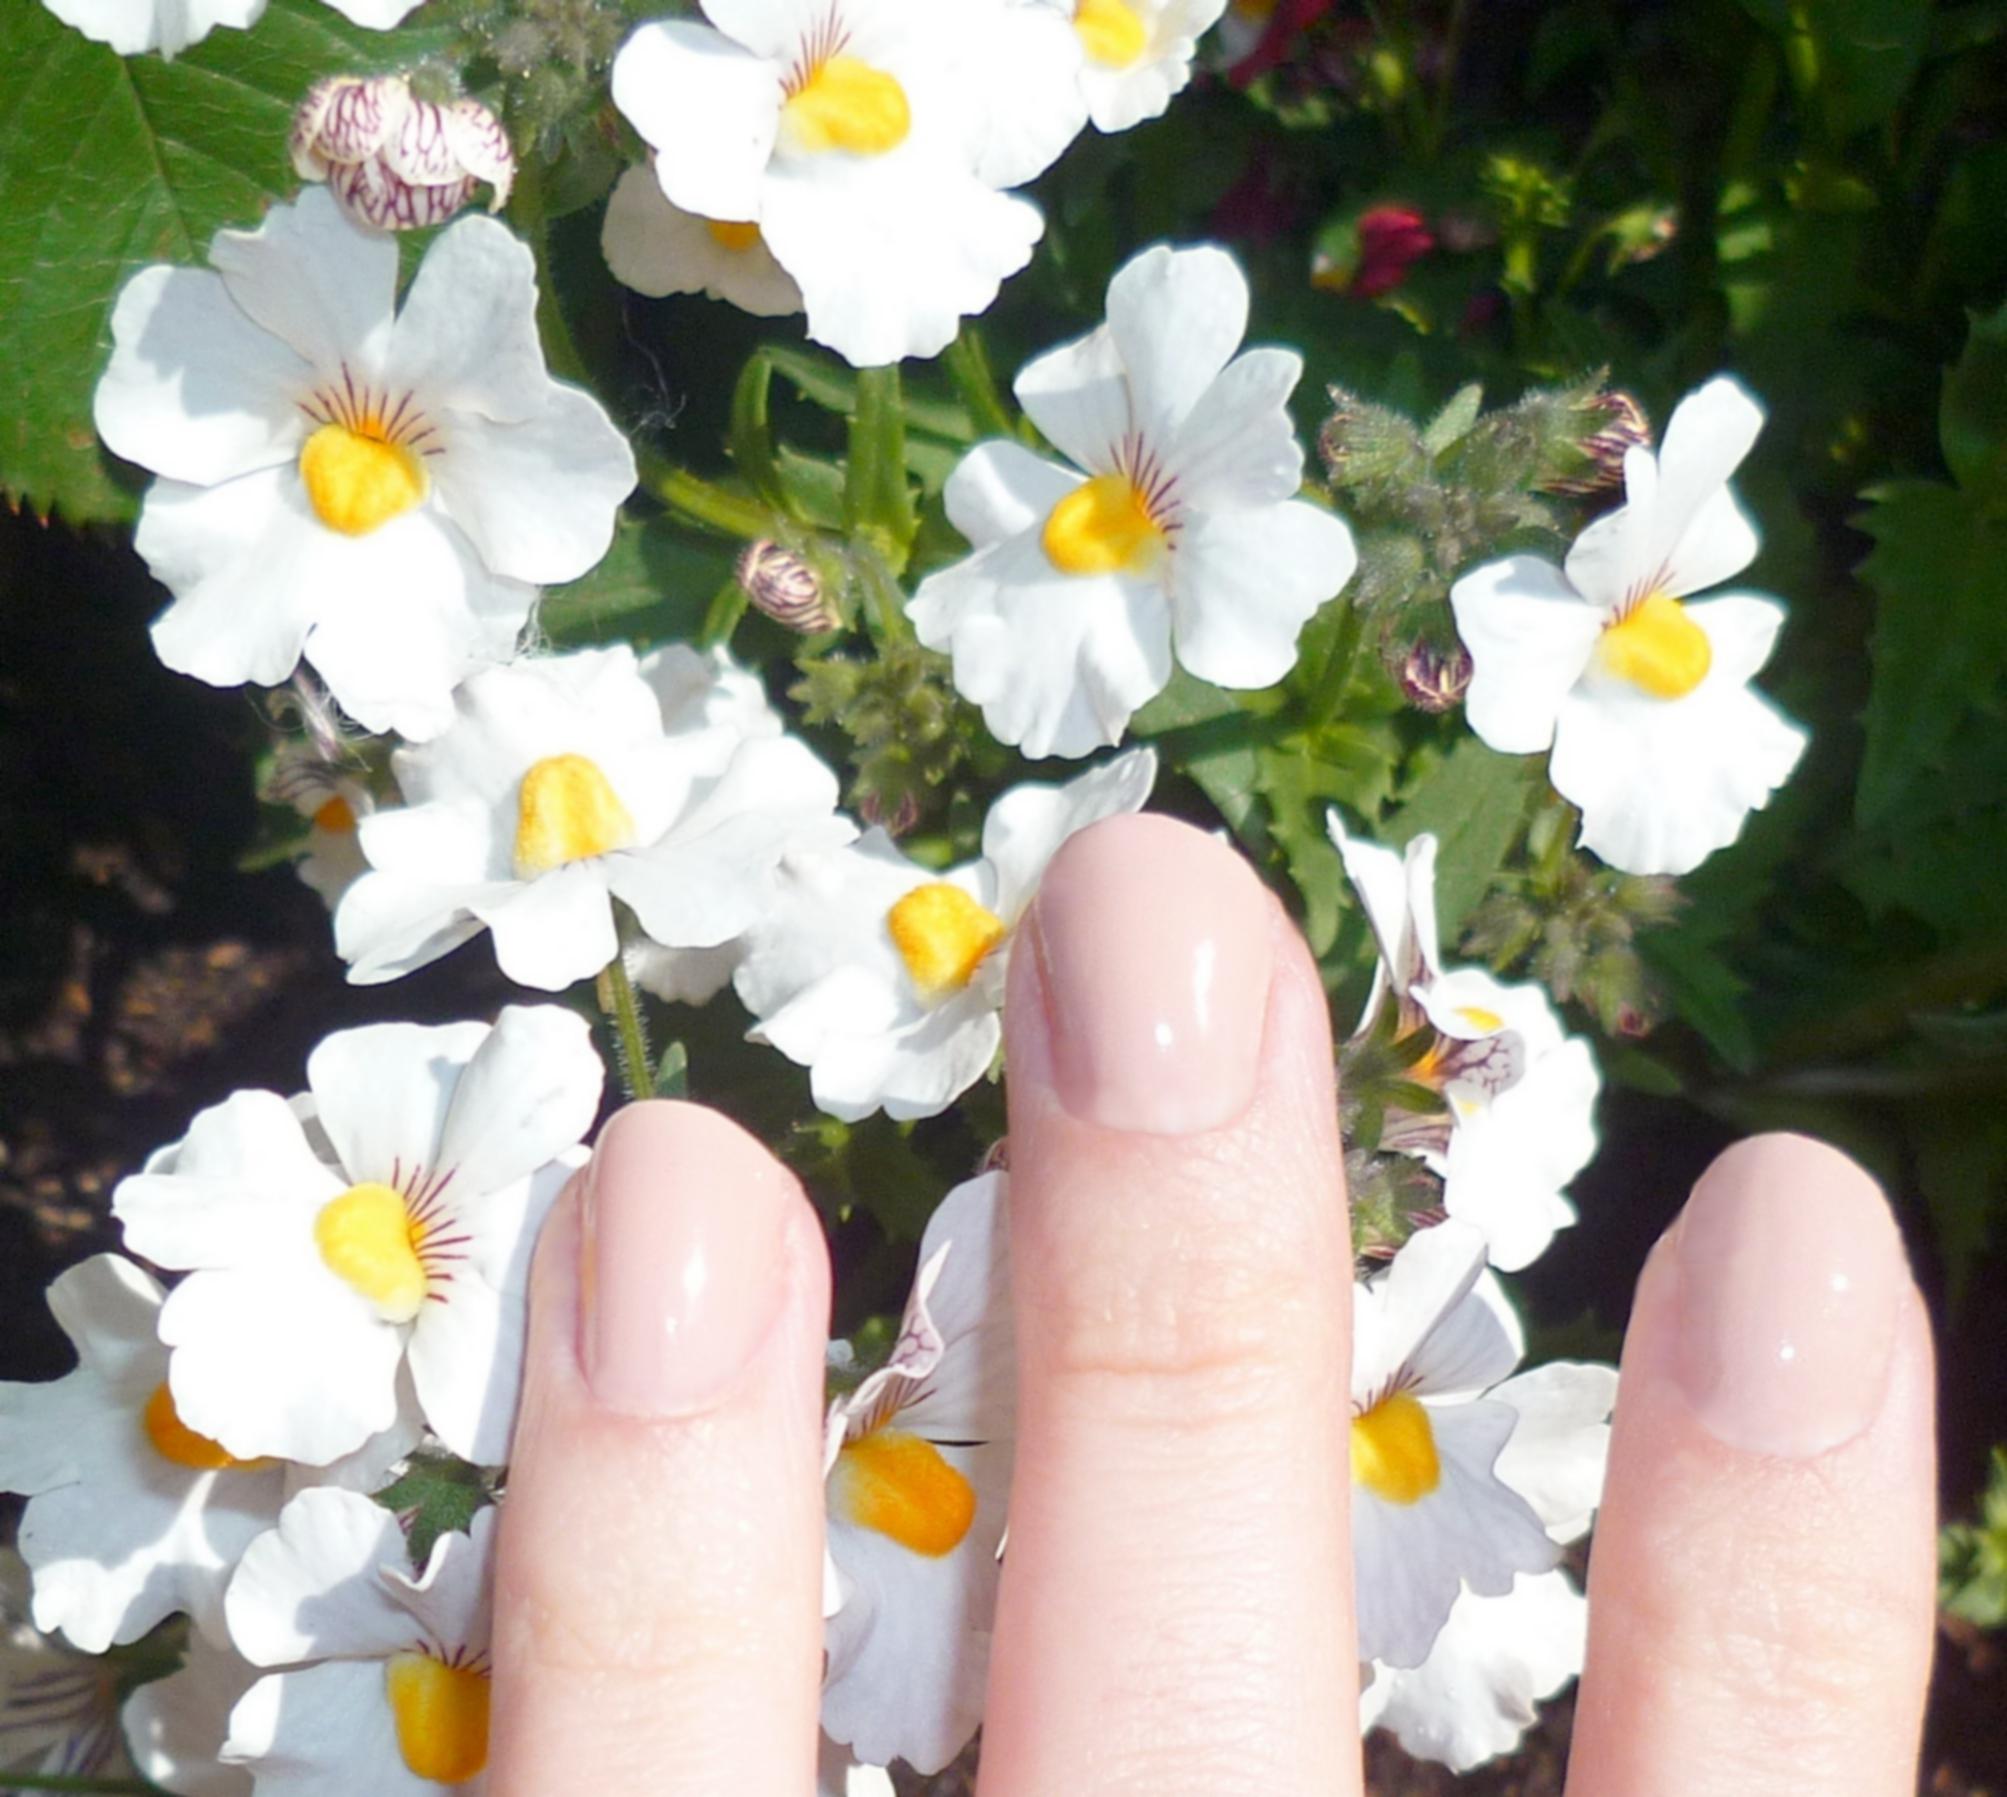 magnolia yves rocher (2)